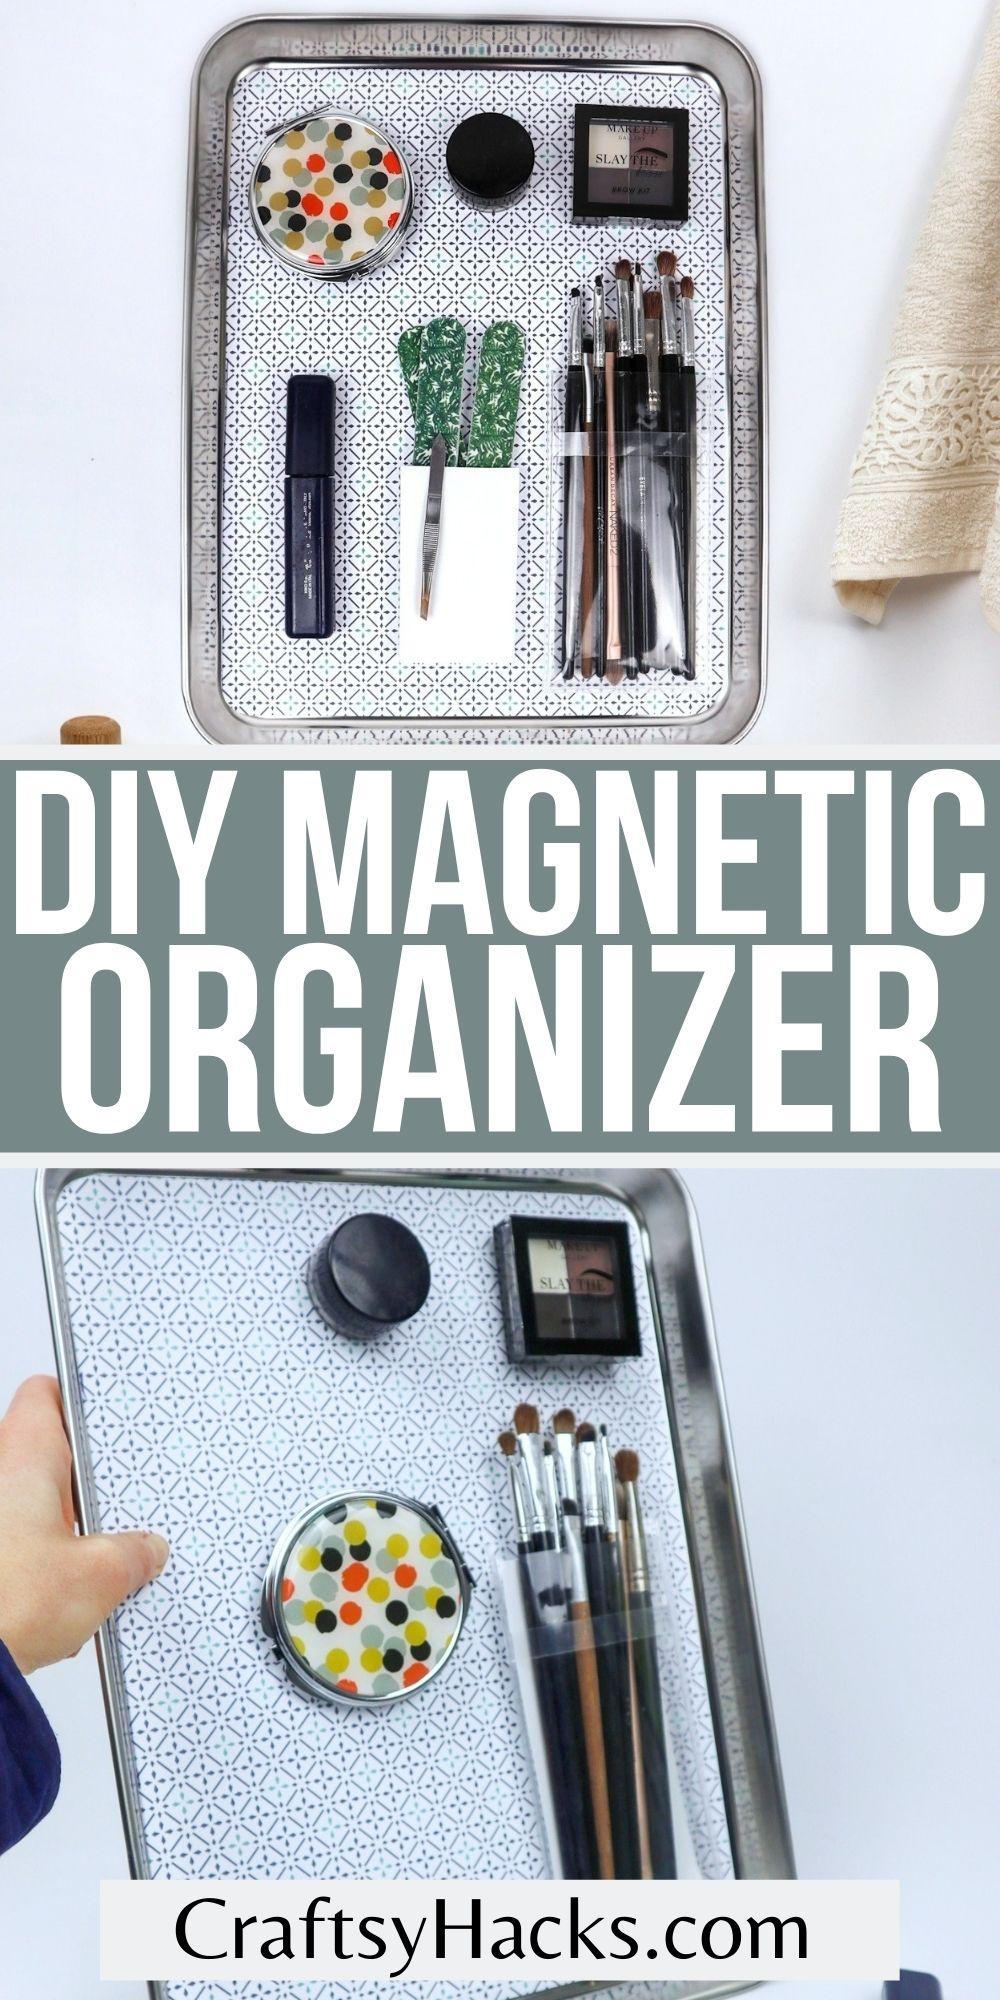 diy magnetic organizer